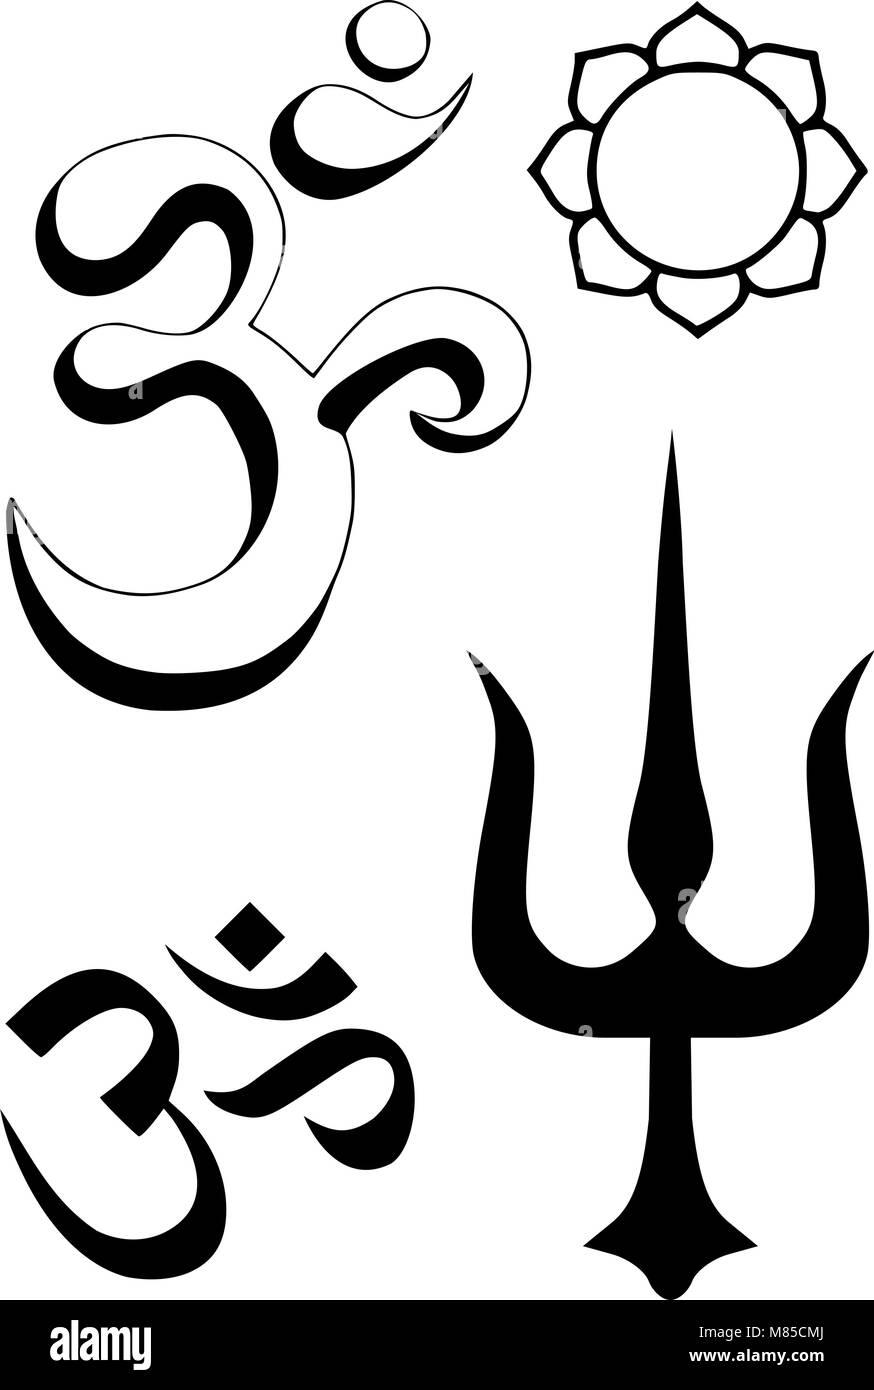 Hindu Religious Symbols Stock Vector Art Illustration Vector